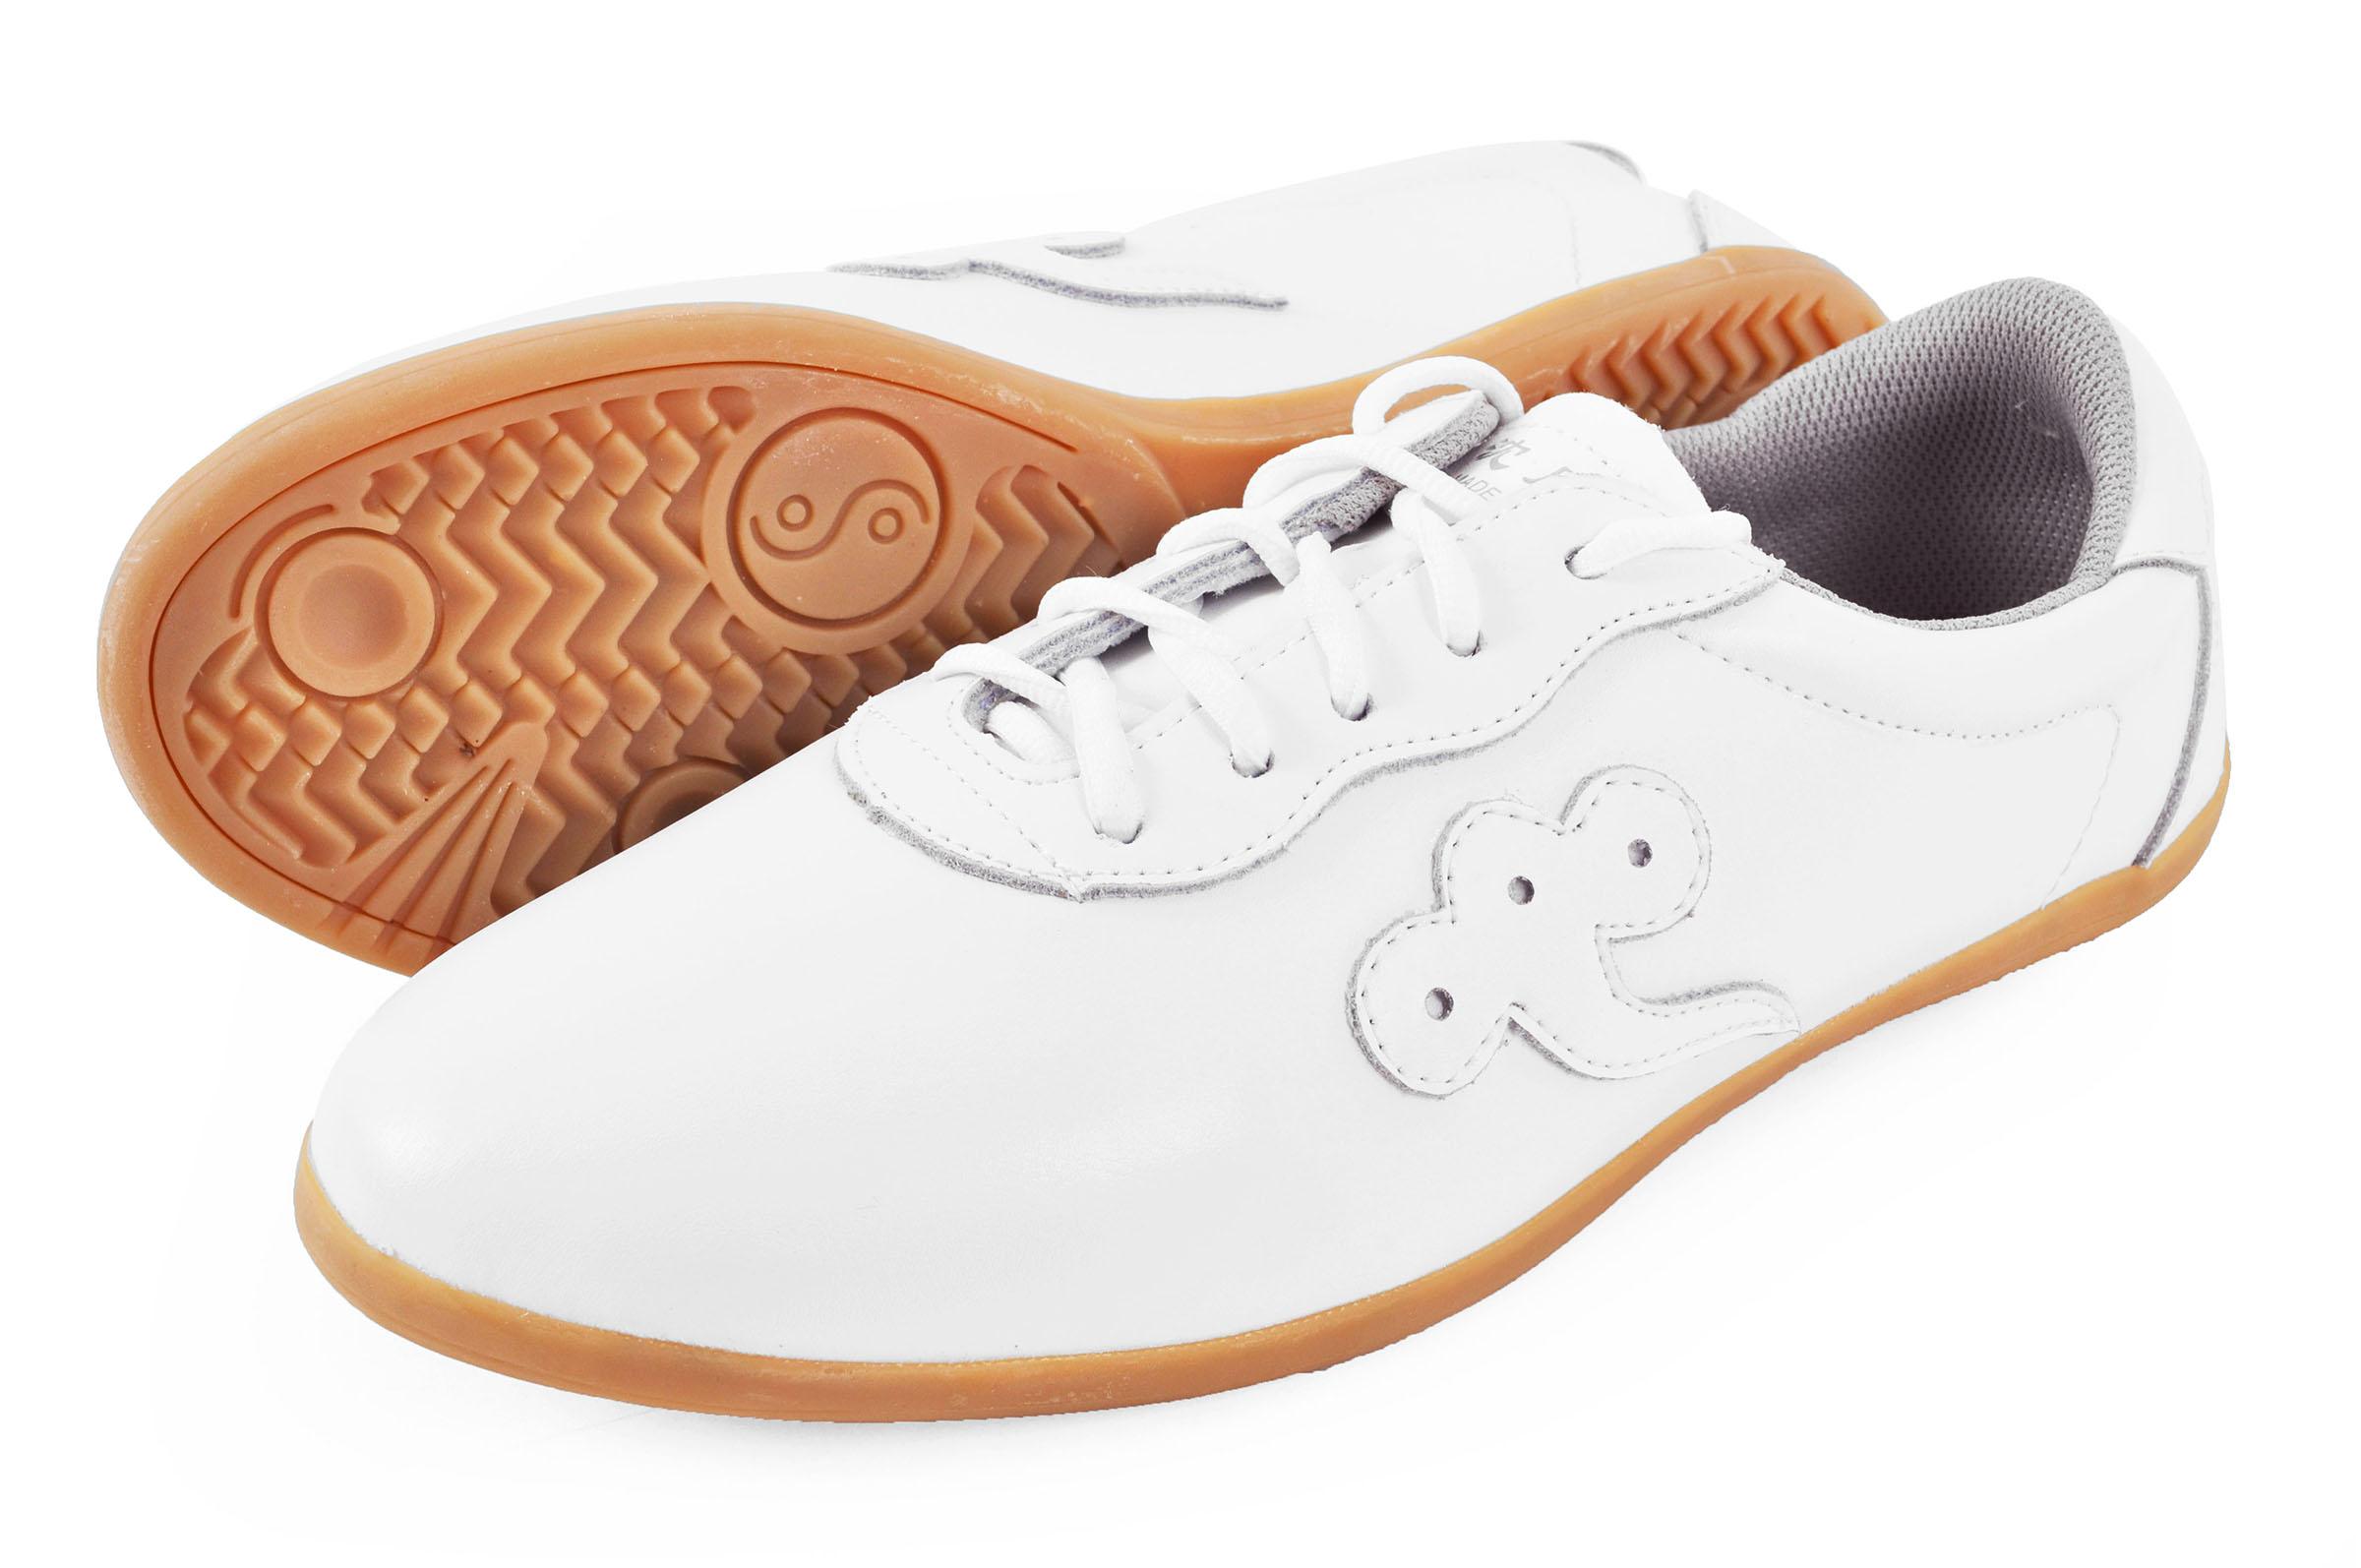 Zapatos Taiji 'Qiankun', Negros - 37